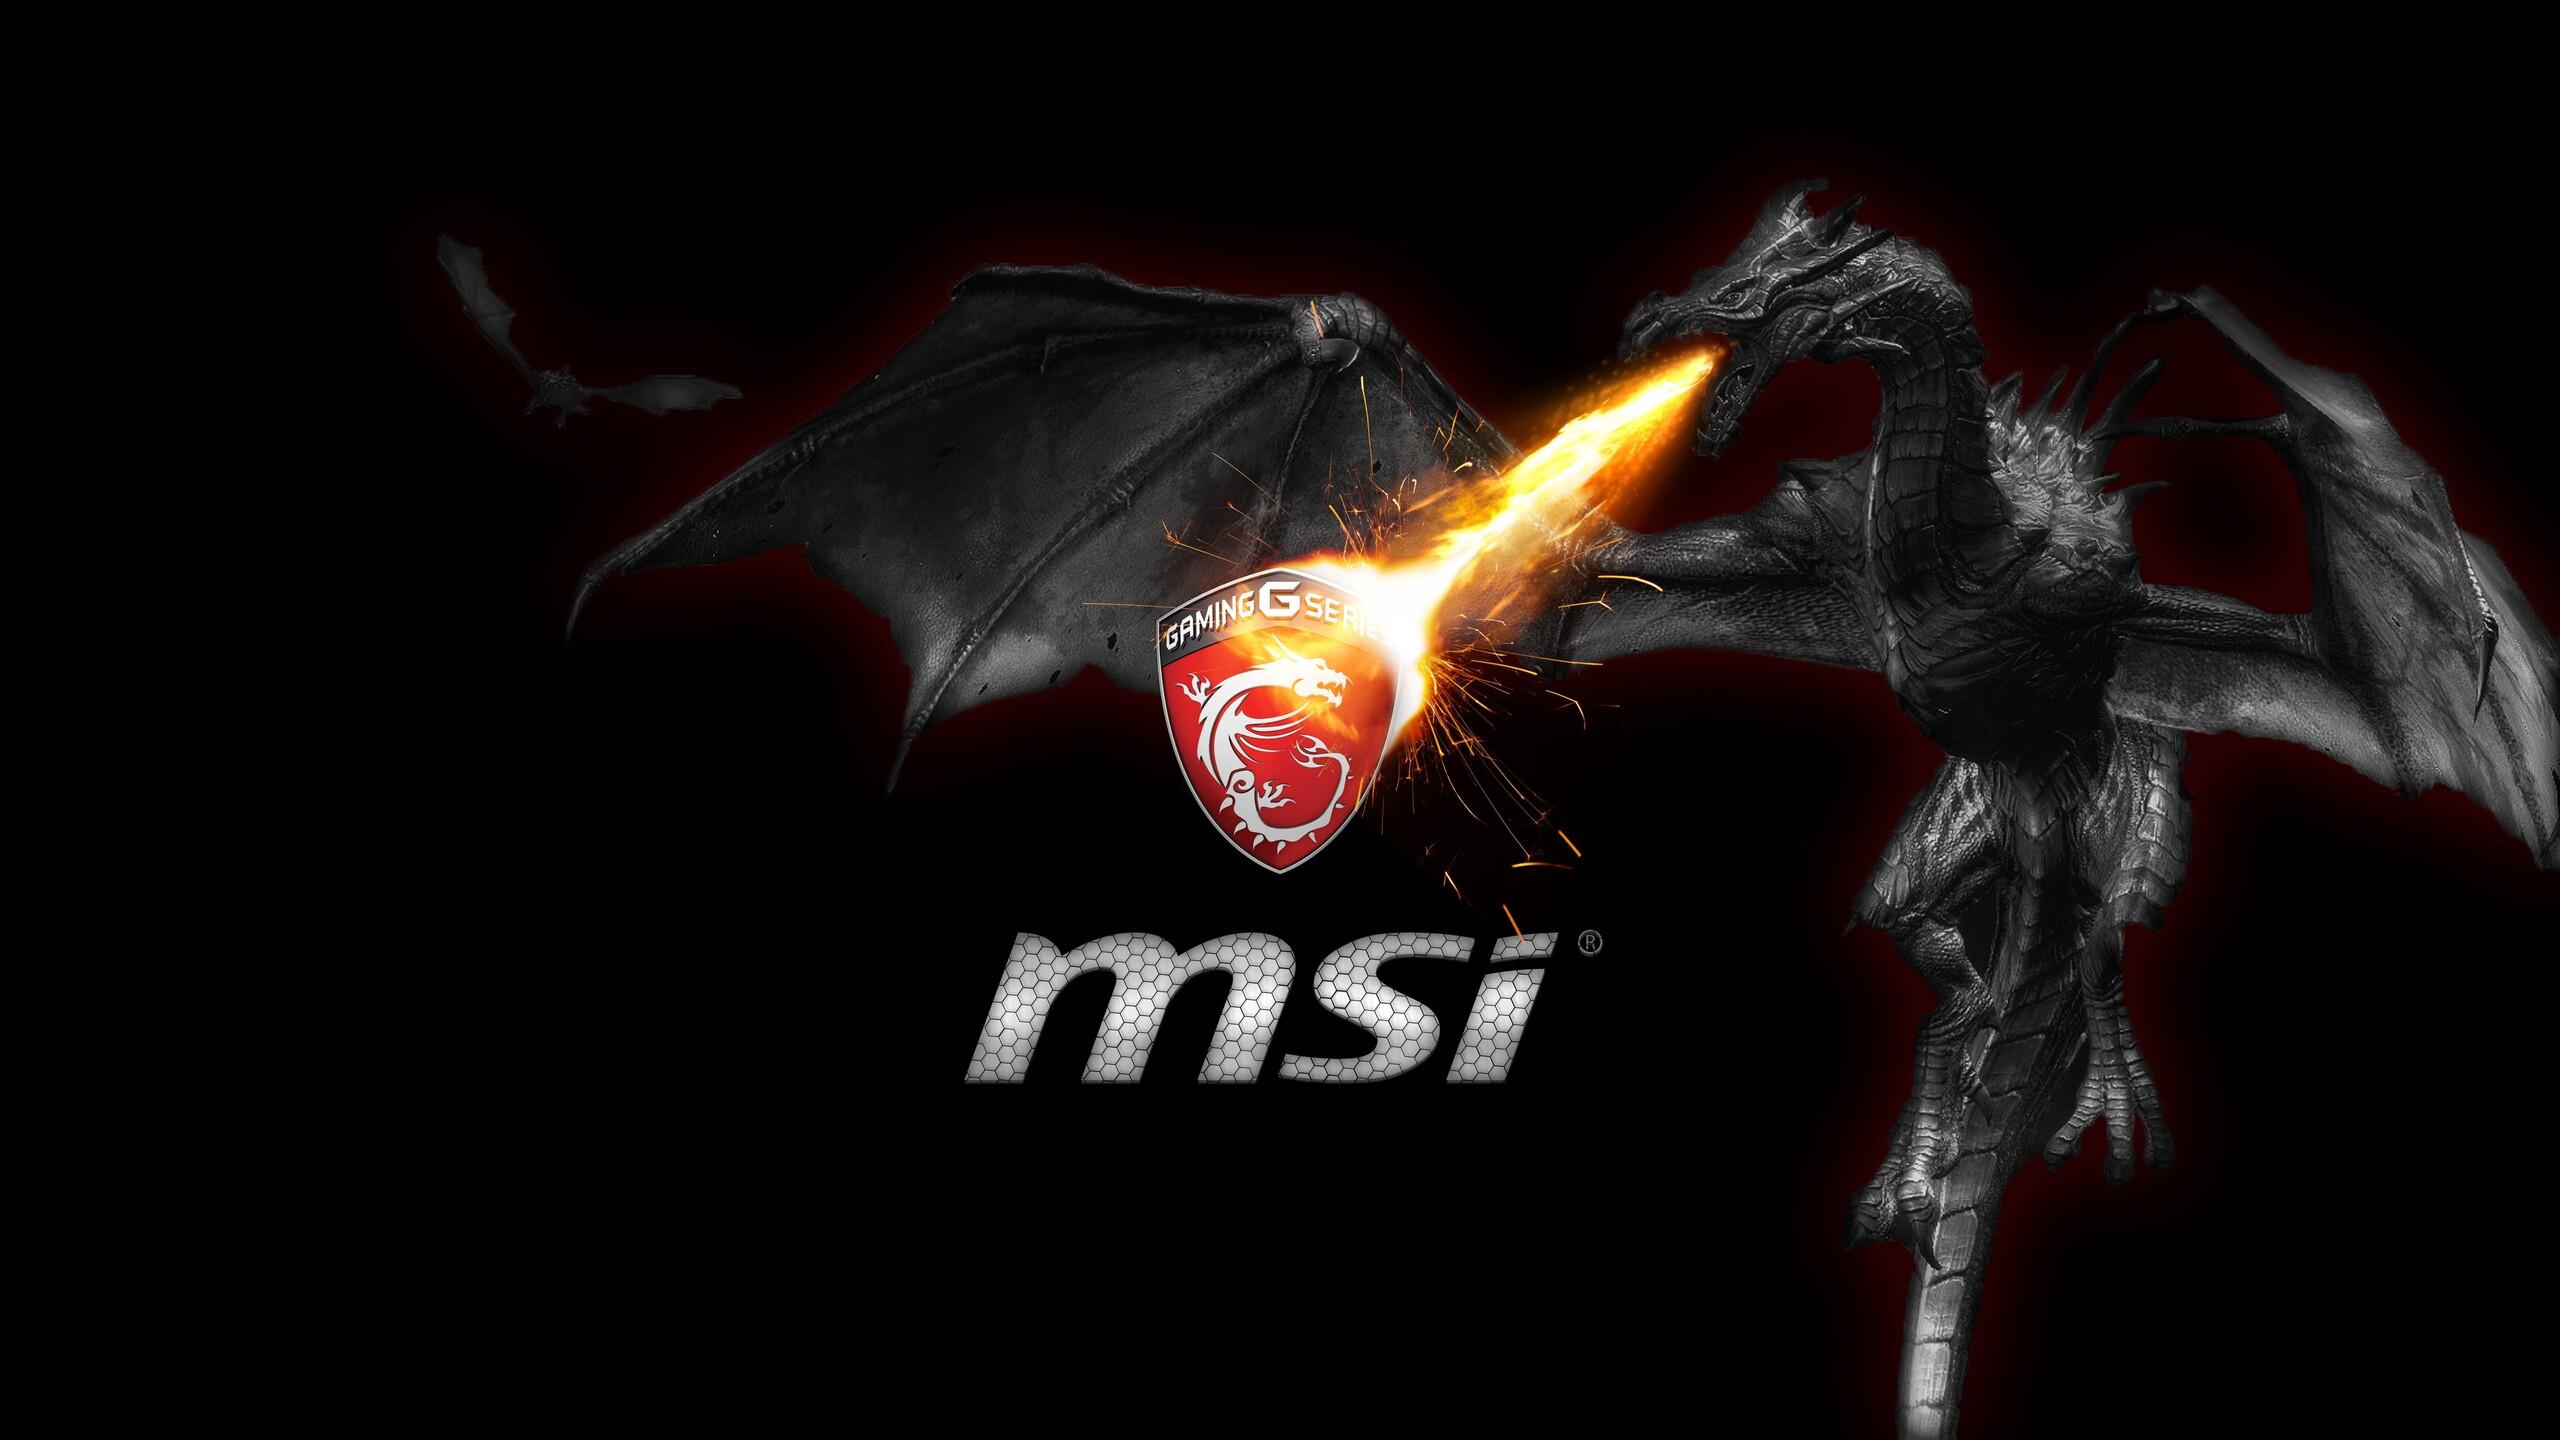 MSI 1440P Resolution HD 4k Wallpapers